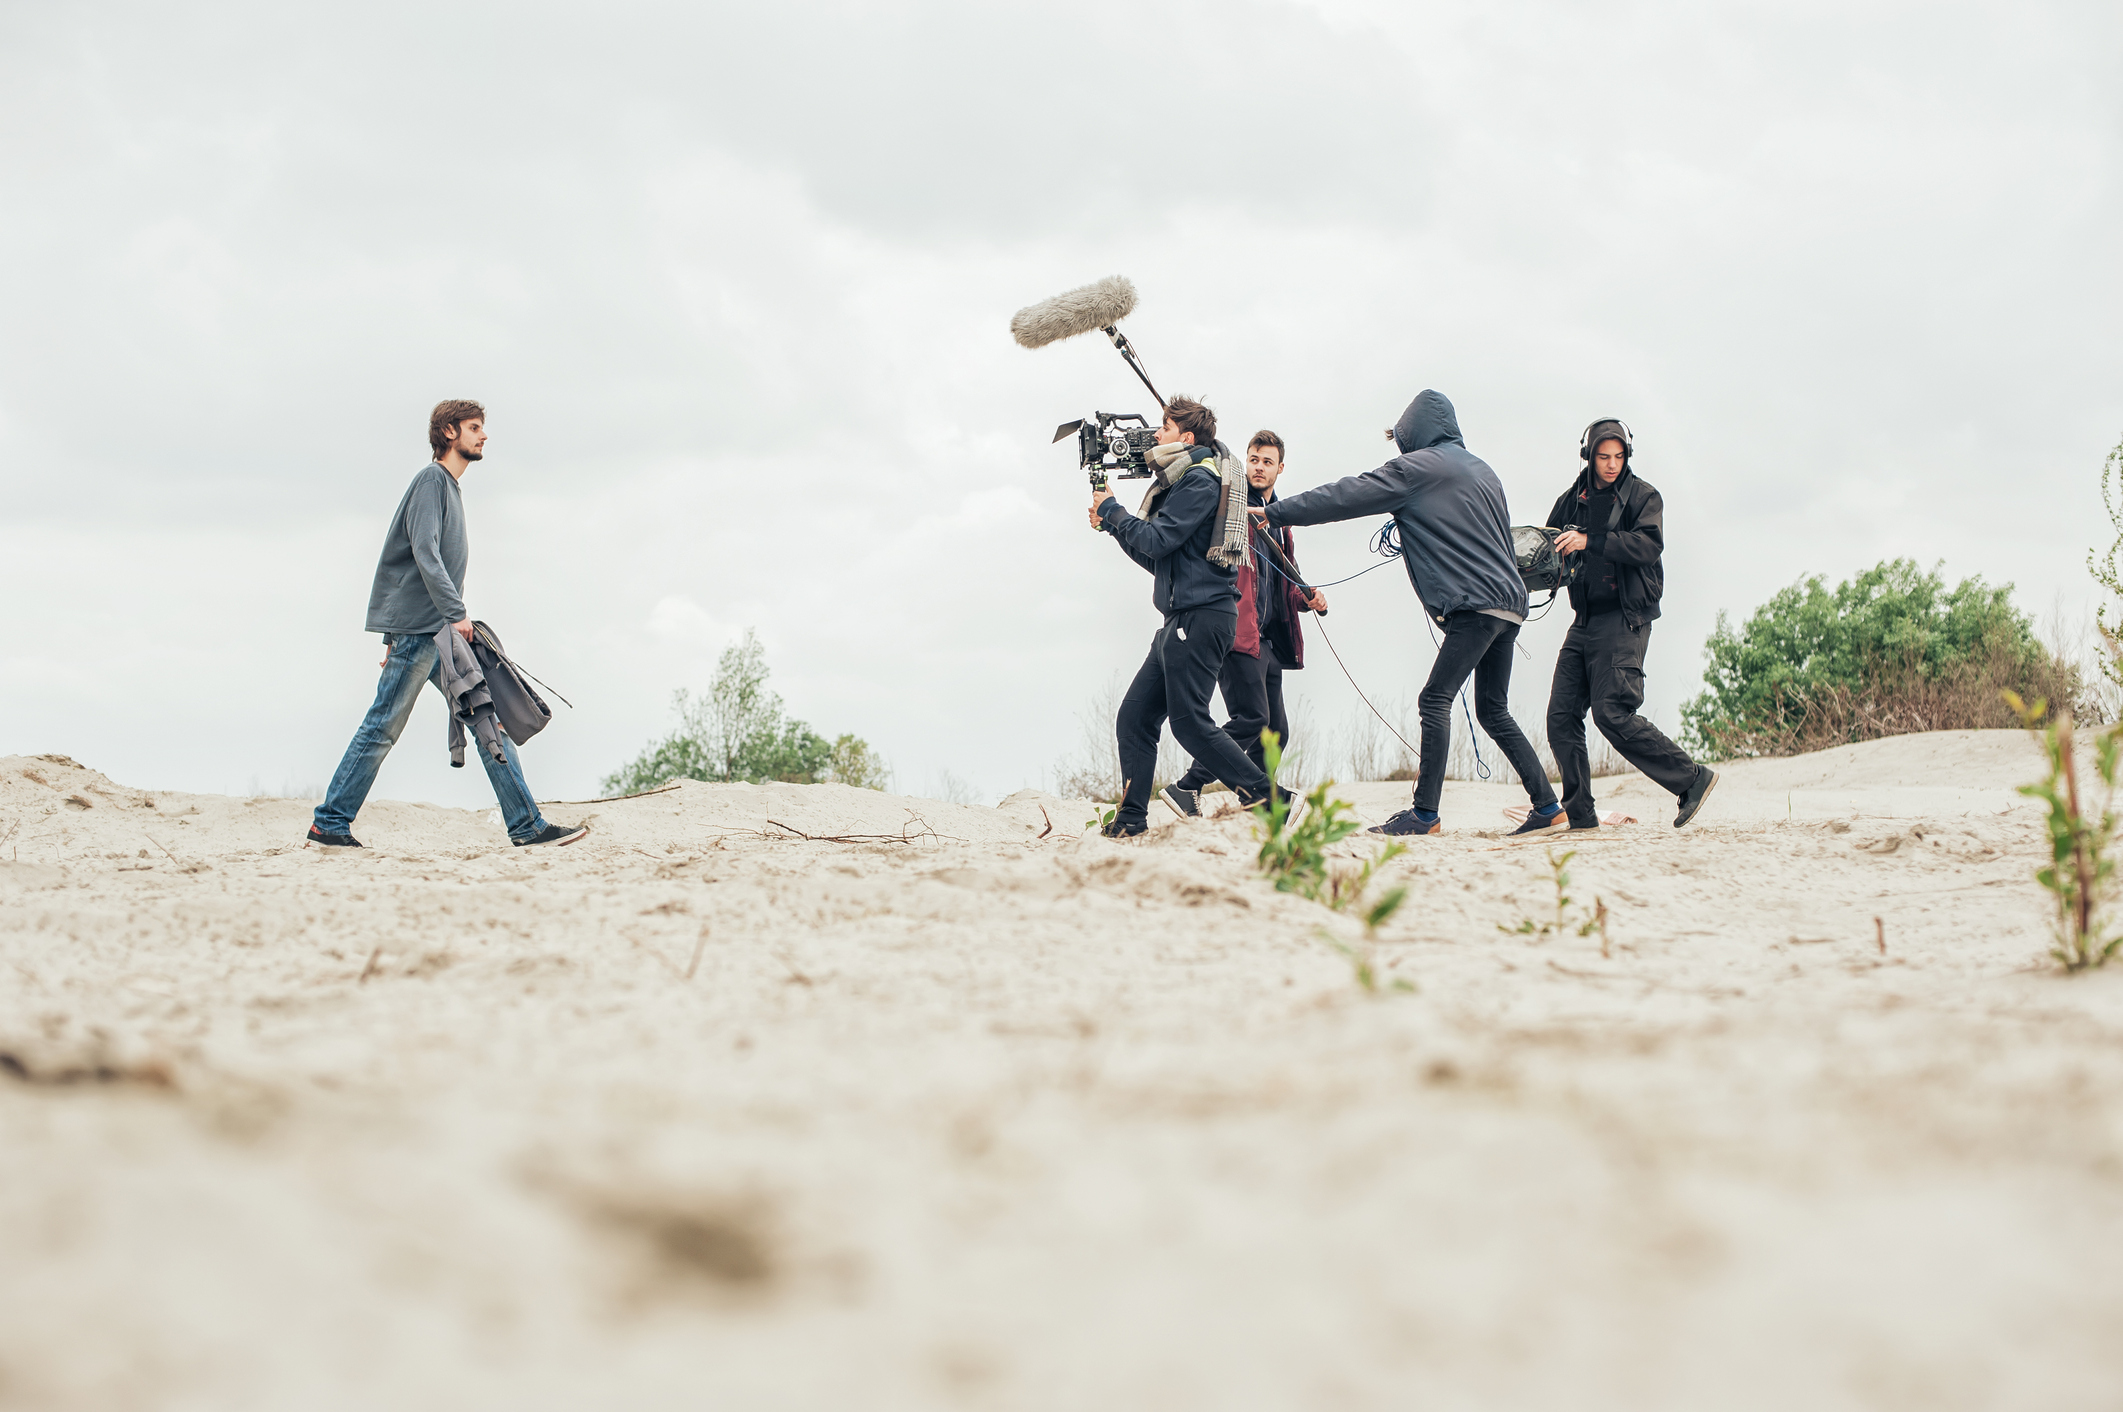 Behind-the-scene.-Film-crew-filming-movie-scene-outdoor-682180238_2125x1414.jpeg